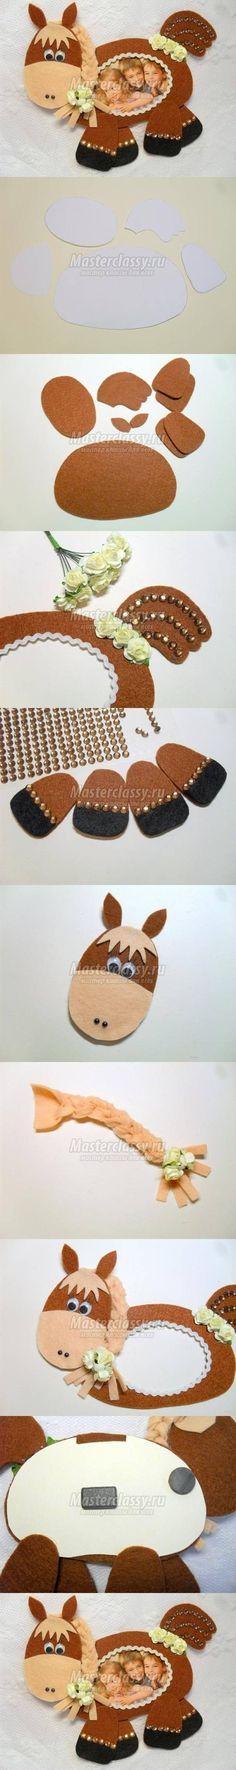 DIY Felt Horse Picture Frame diy how to tutorial